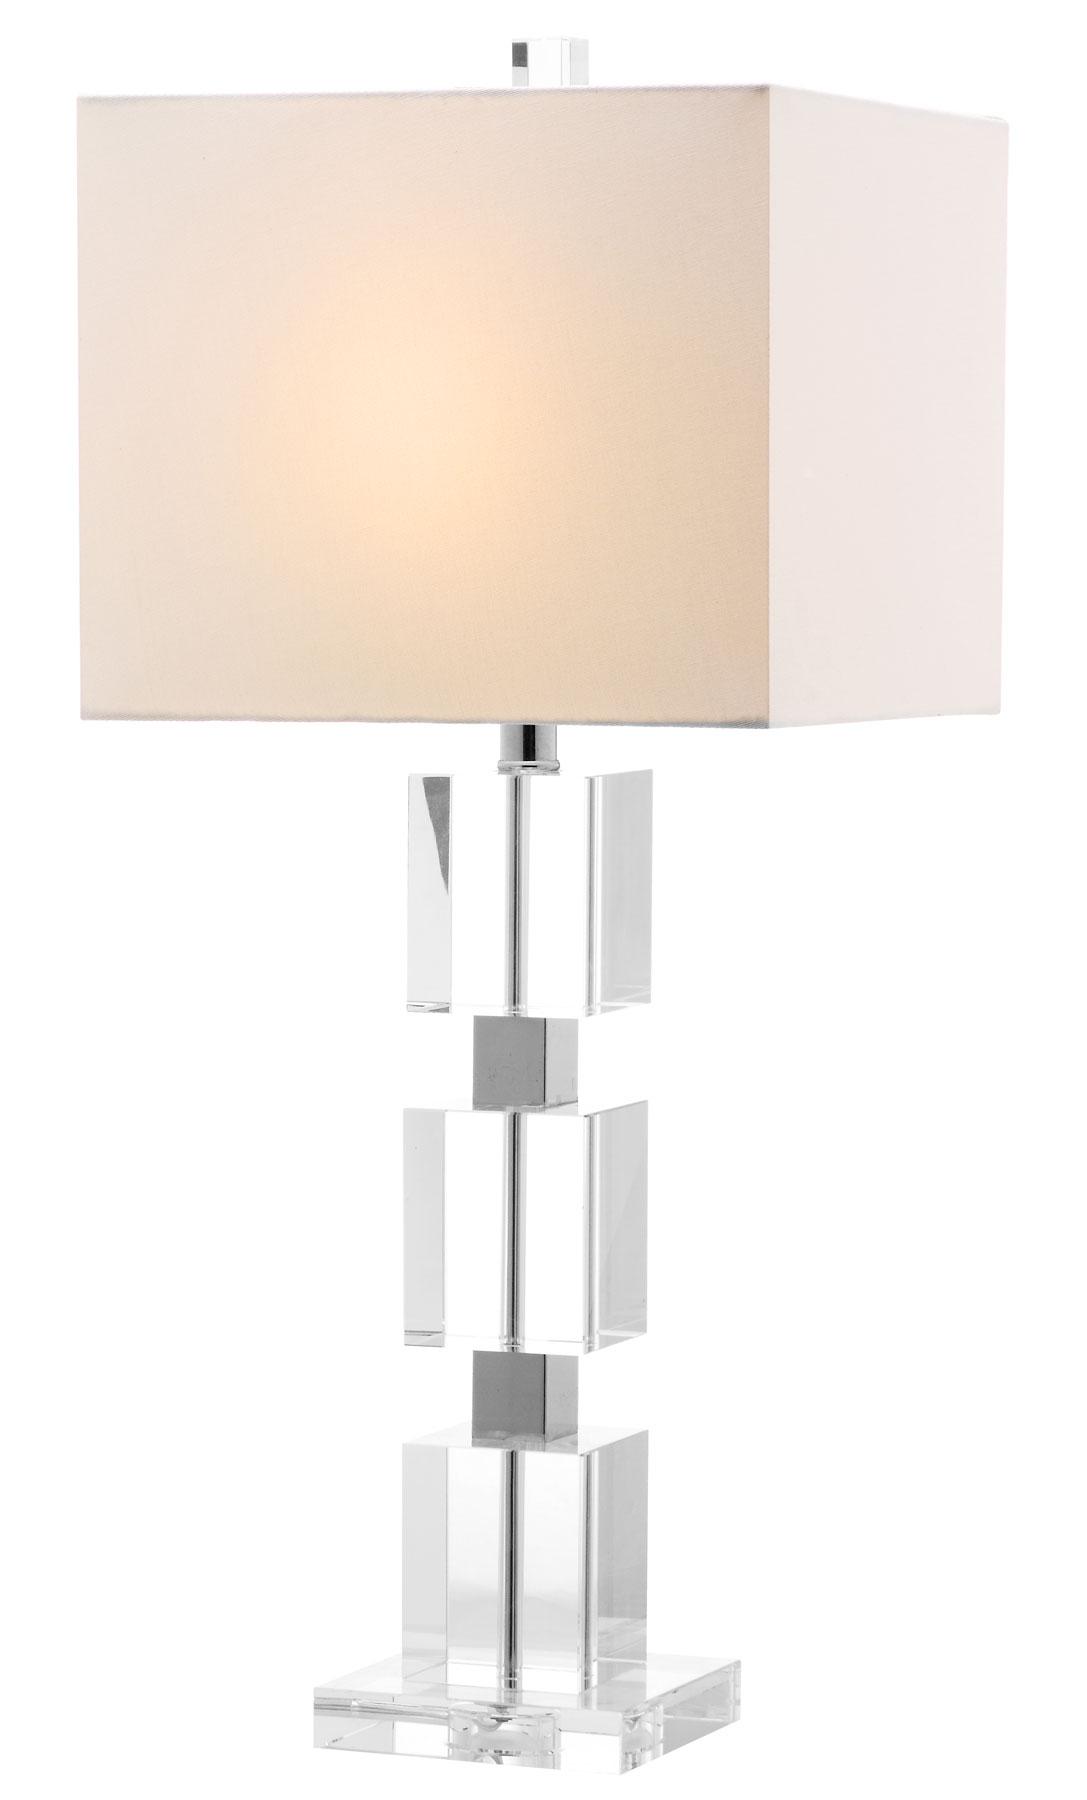 #SAFAVIEH  sc 1 st  Safavieh.com & LIT4120A Table Lamps - Lighting by Safavieh azcodes.com